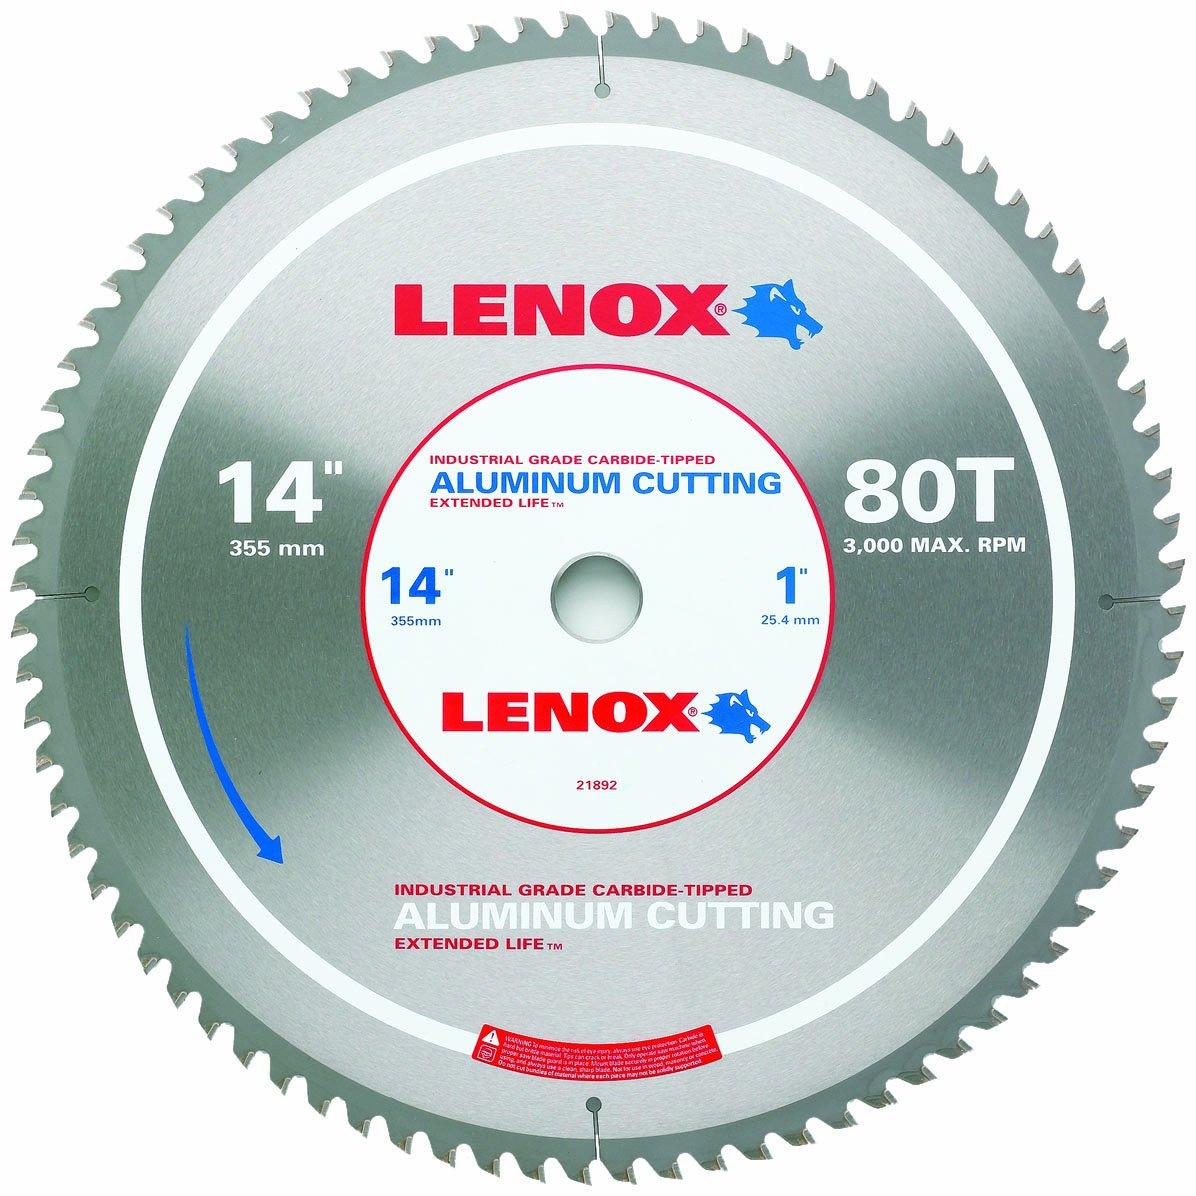 LENOX Tools Metal-Cutting Circular Saw Blade, Aluminum-Cutting, 14-inch, 80-Tooth (21892AL140080CT)